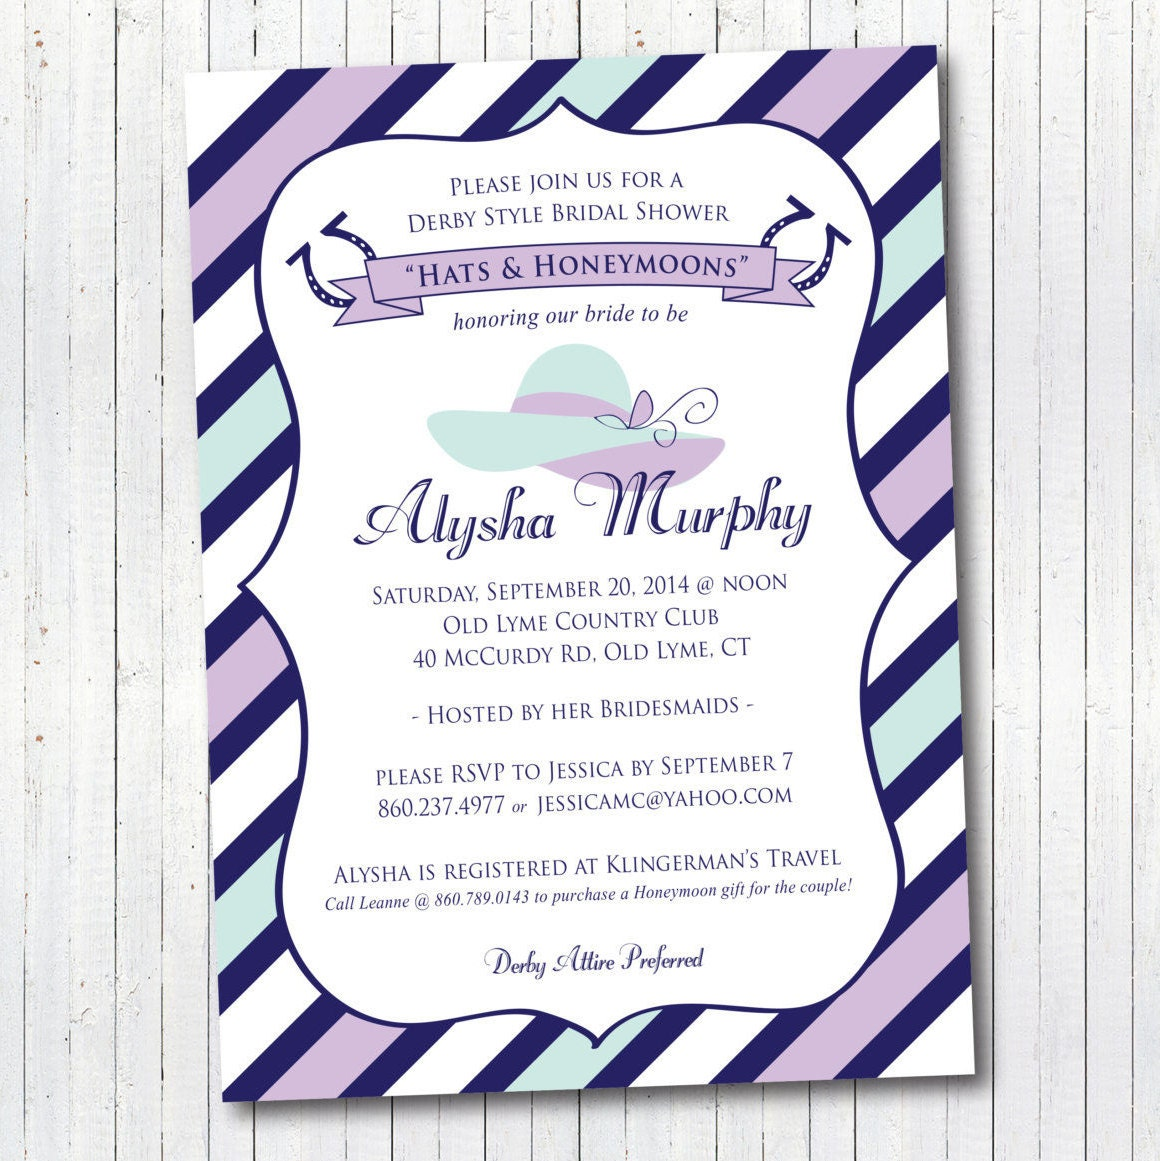 Kentucky Derby Bridal Shower Invitation Lucky in Love | Etsy